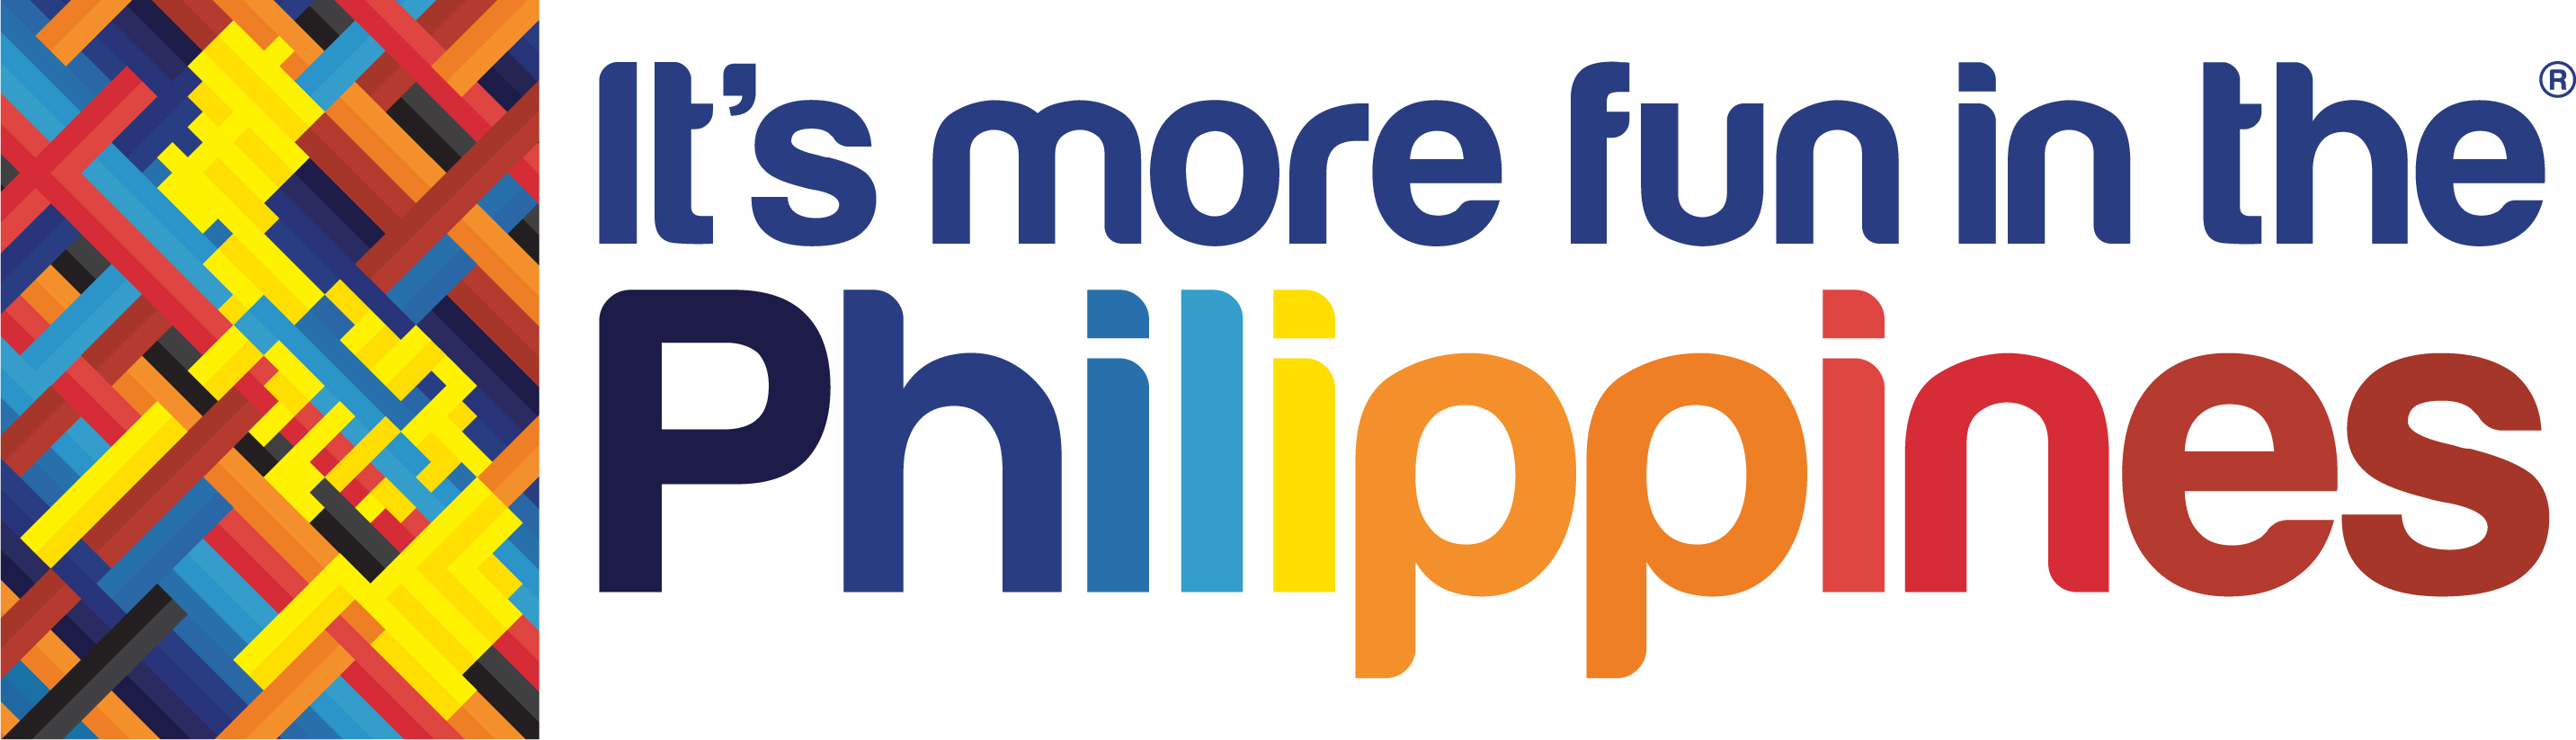 http://img4info.modetour.com//108/DONGNAMA/JOOYOUNG/PHILIPPINES.jpg